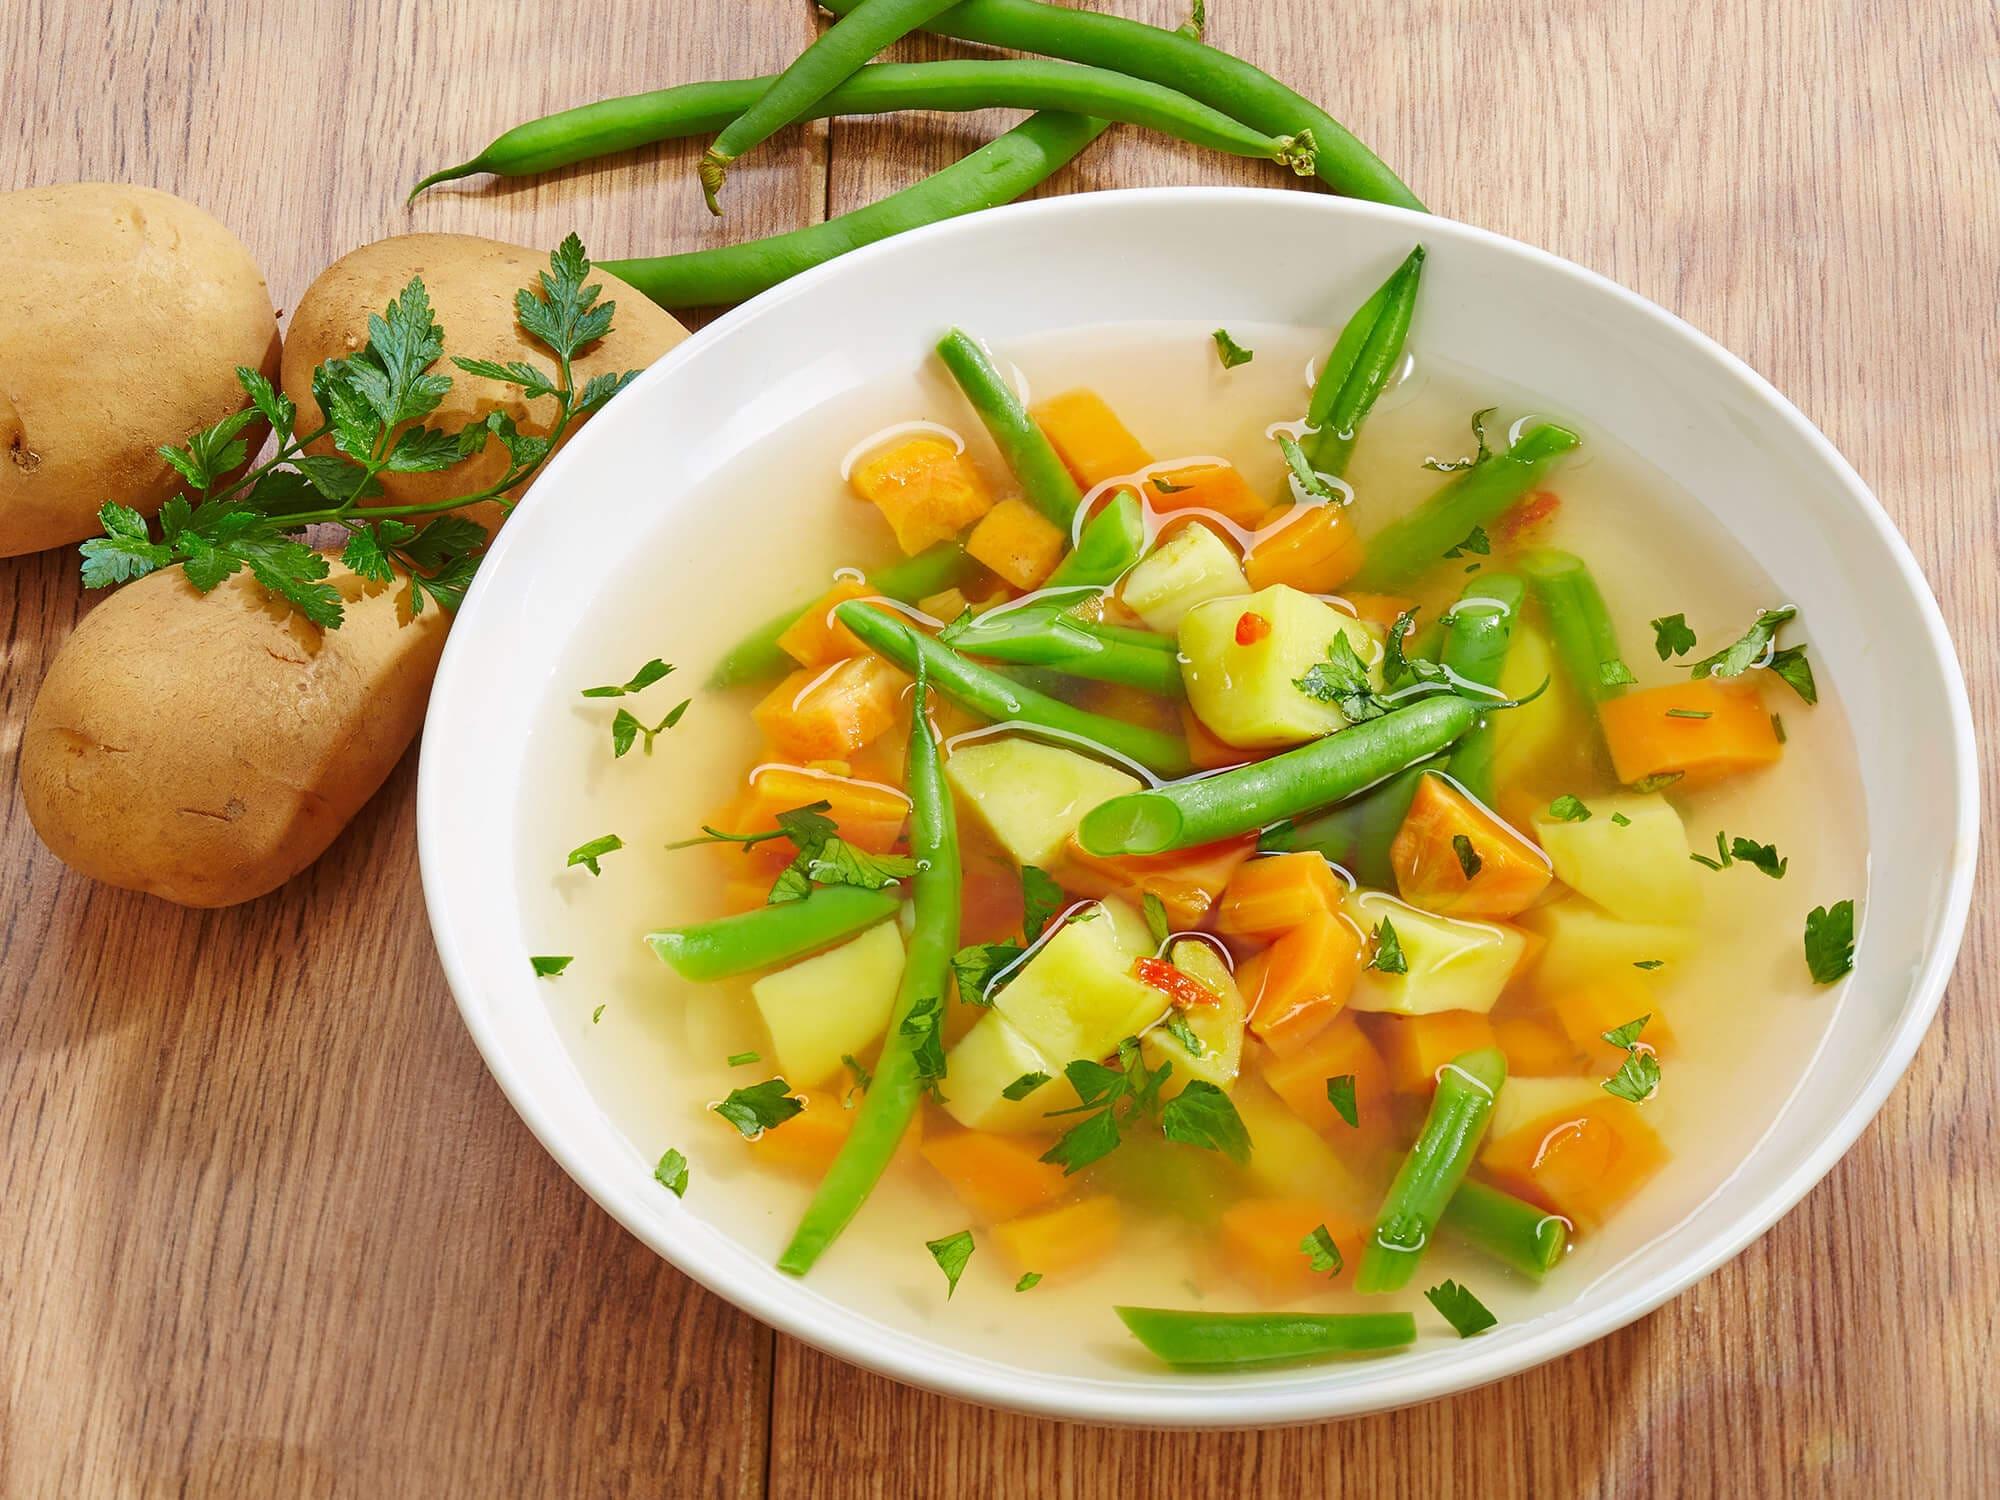 Rezepte Leichte Sommerküche Kalorienarm : Leichte küche abends rezept für kalorienarmes low carb omelett